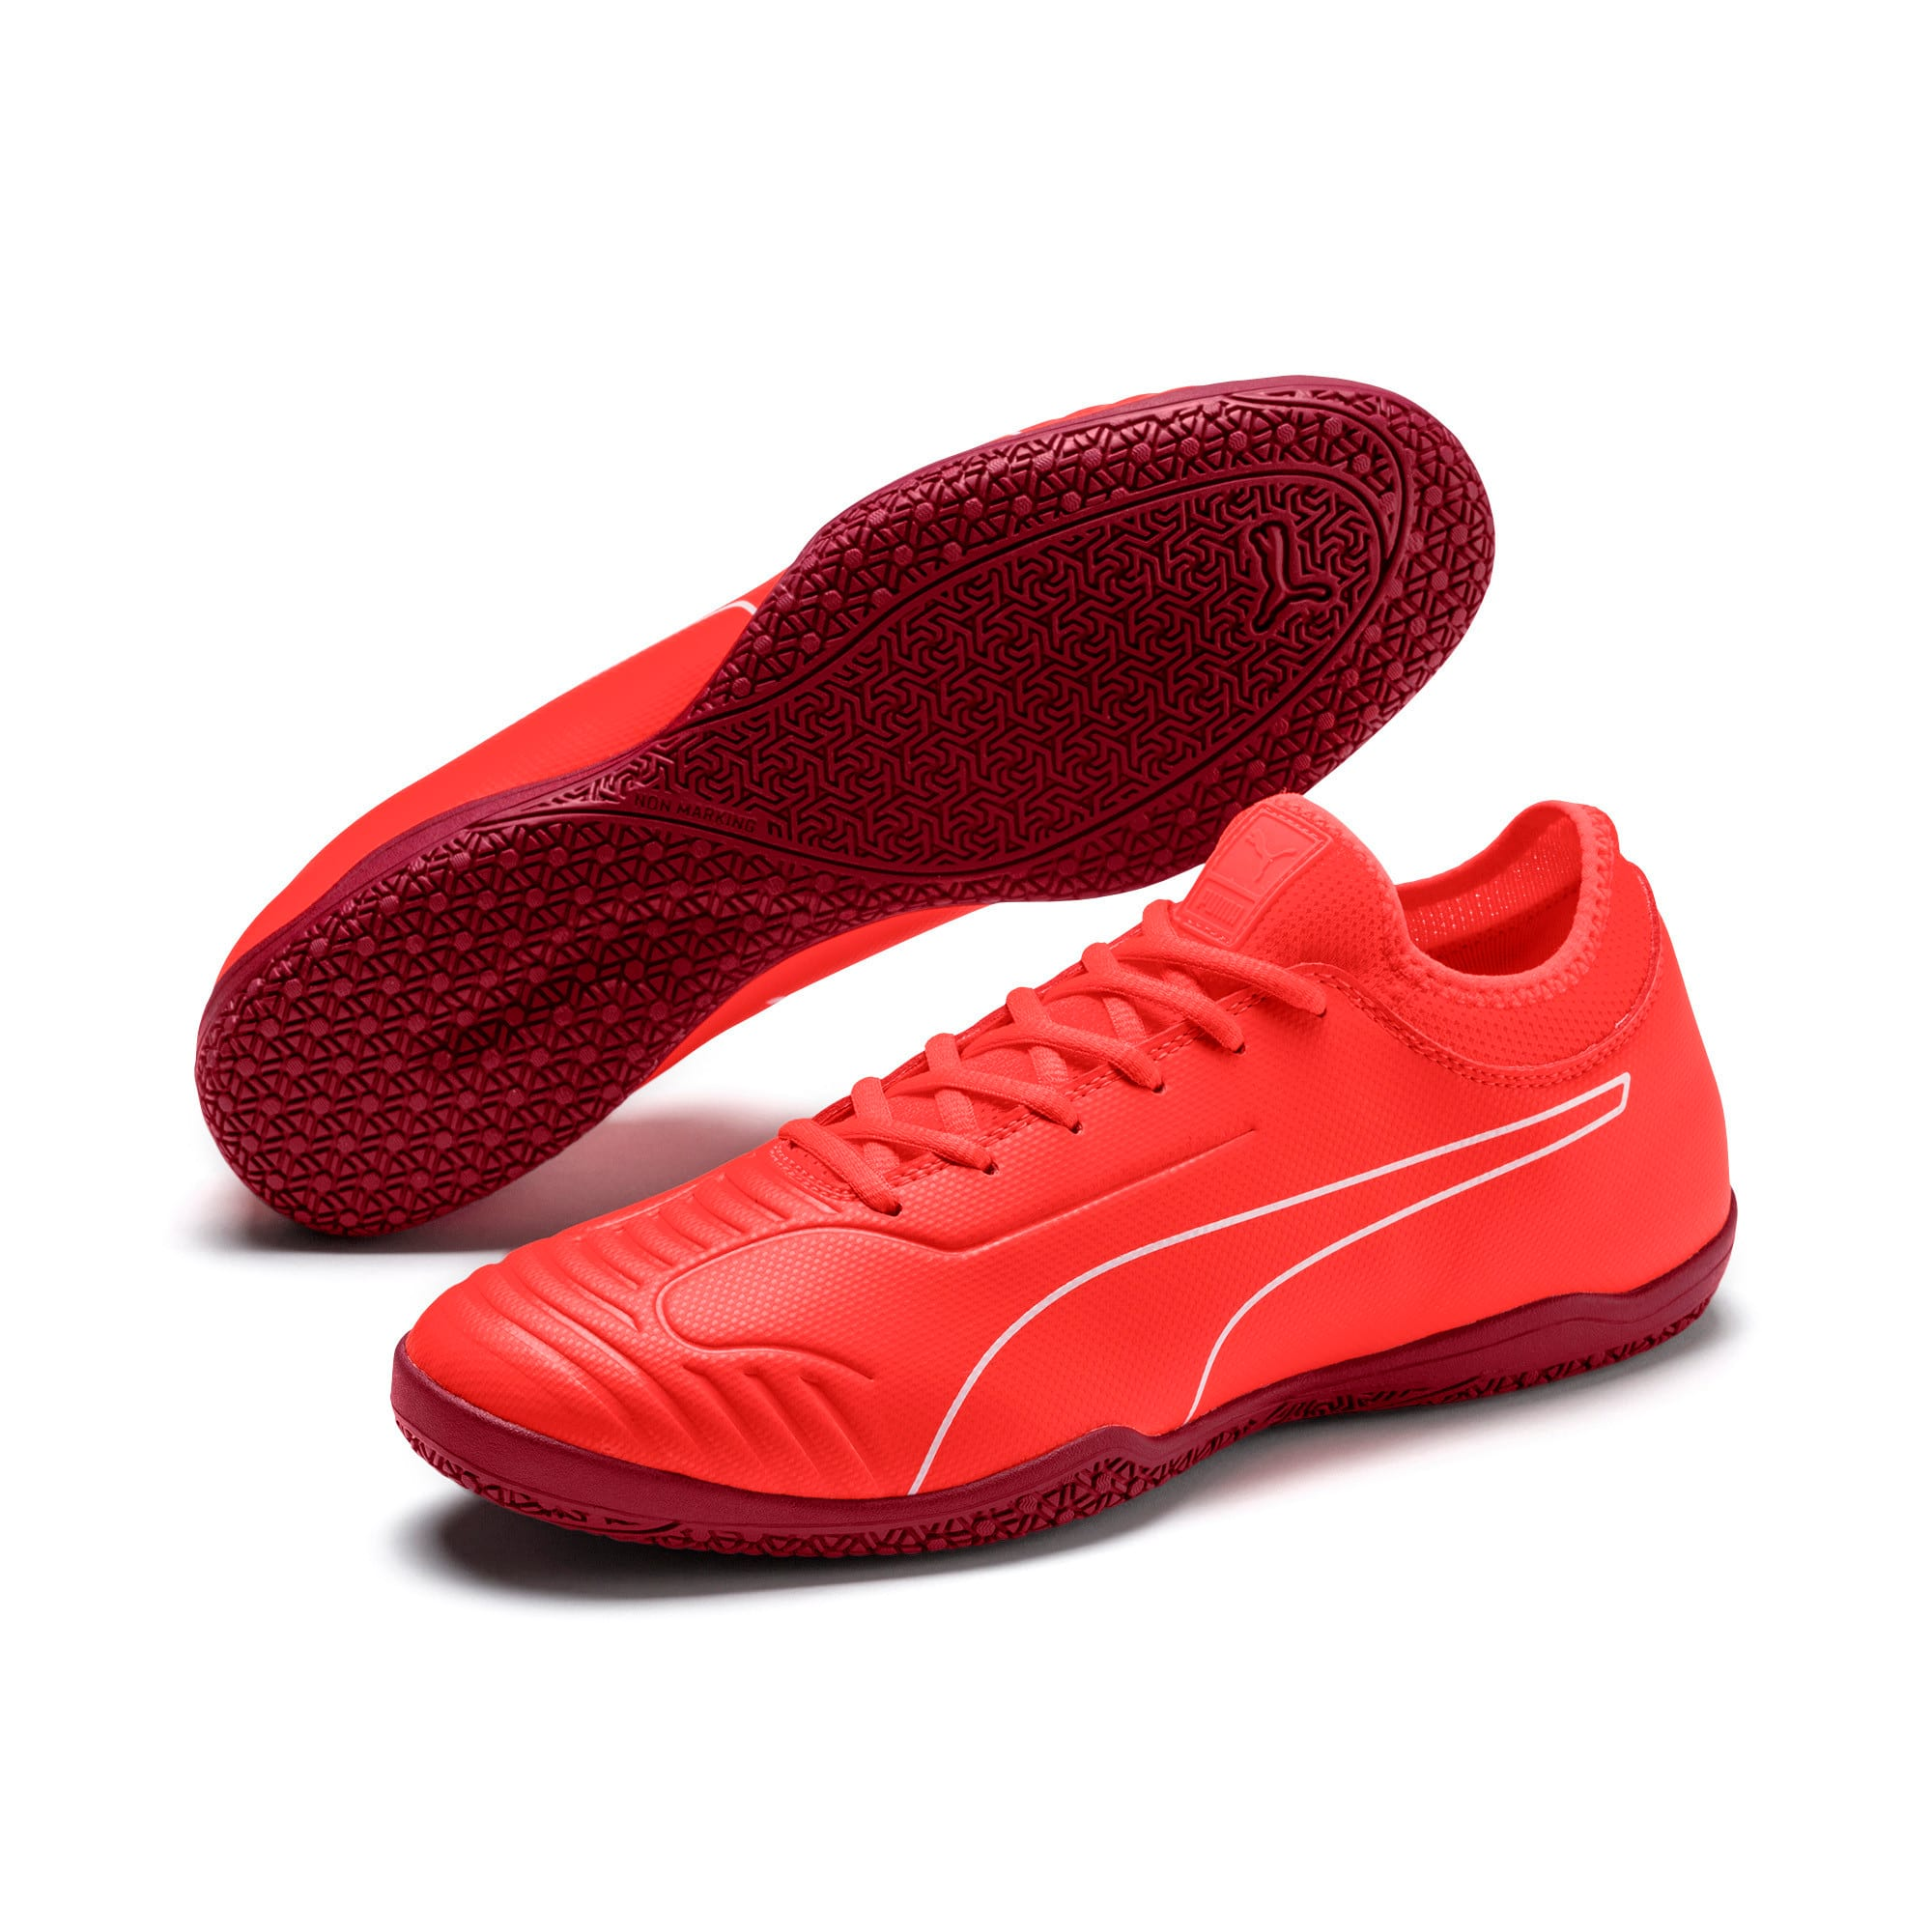 Thumbnail 2 of 365 Sala 2 Men's Soccer Shoes, Nrgy Red-Rhubarb, medium